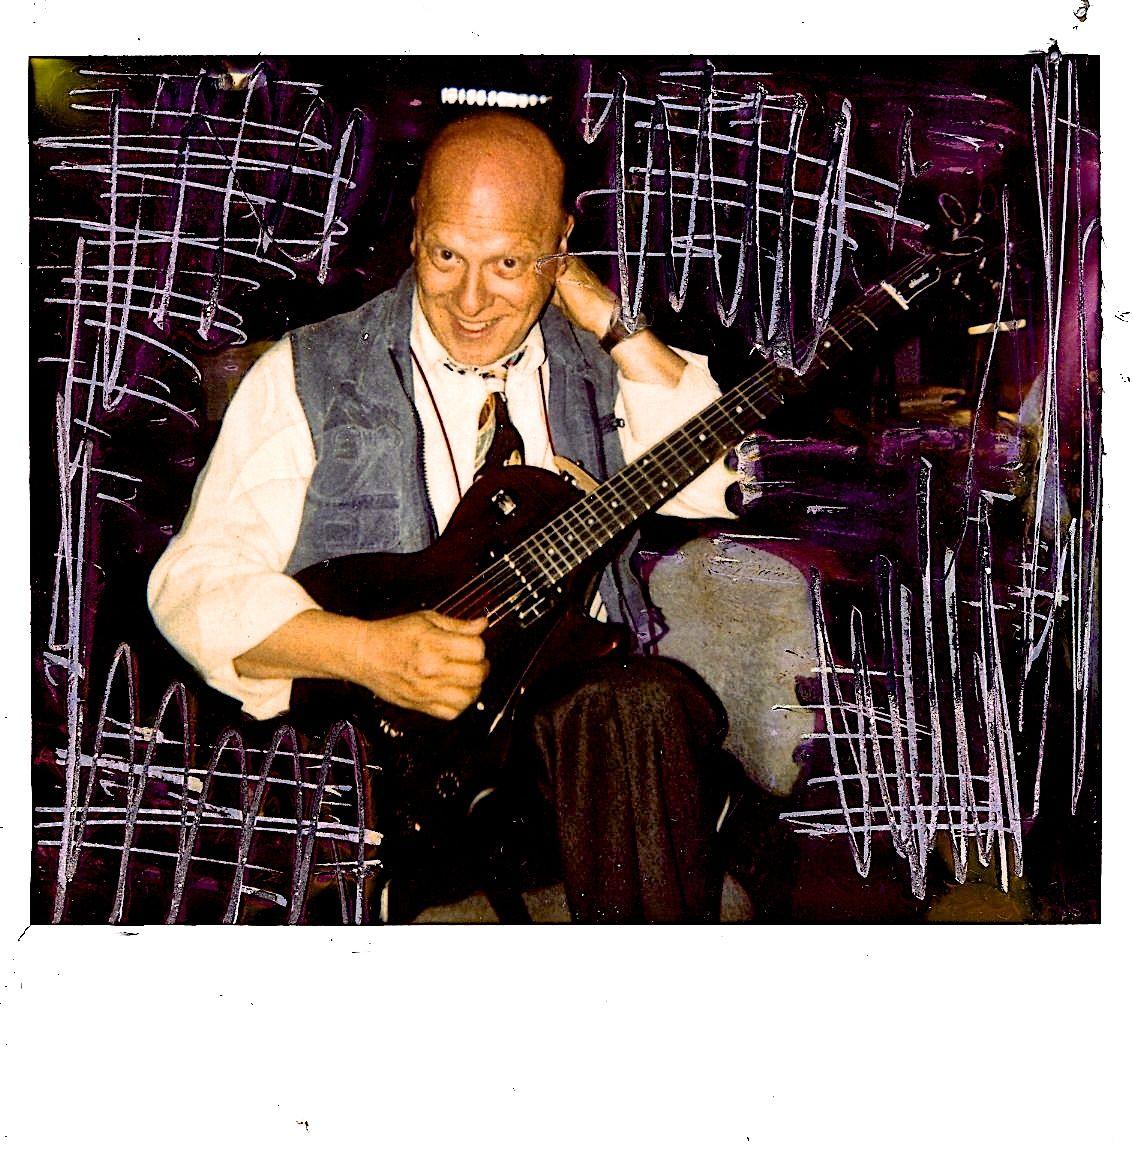 Bobby guitar